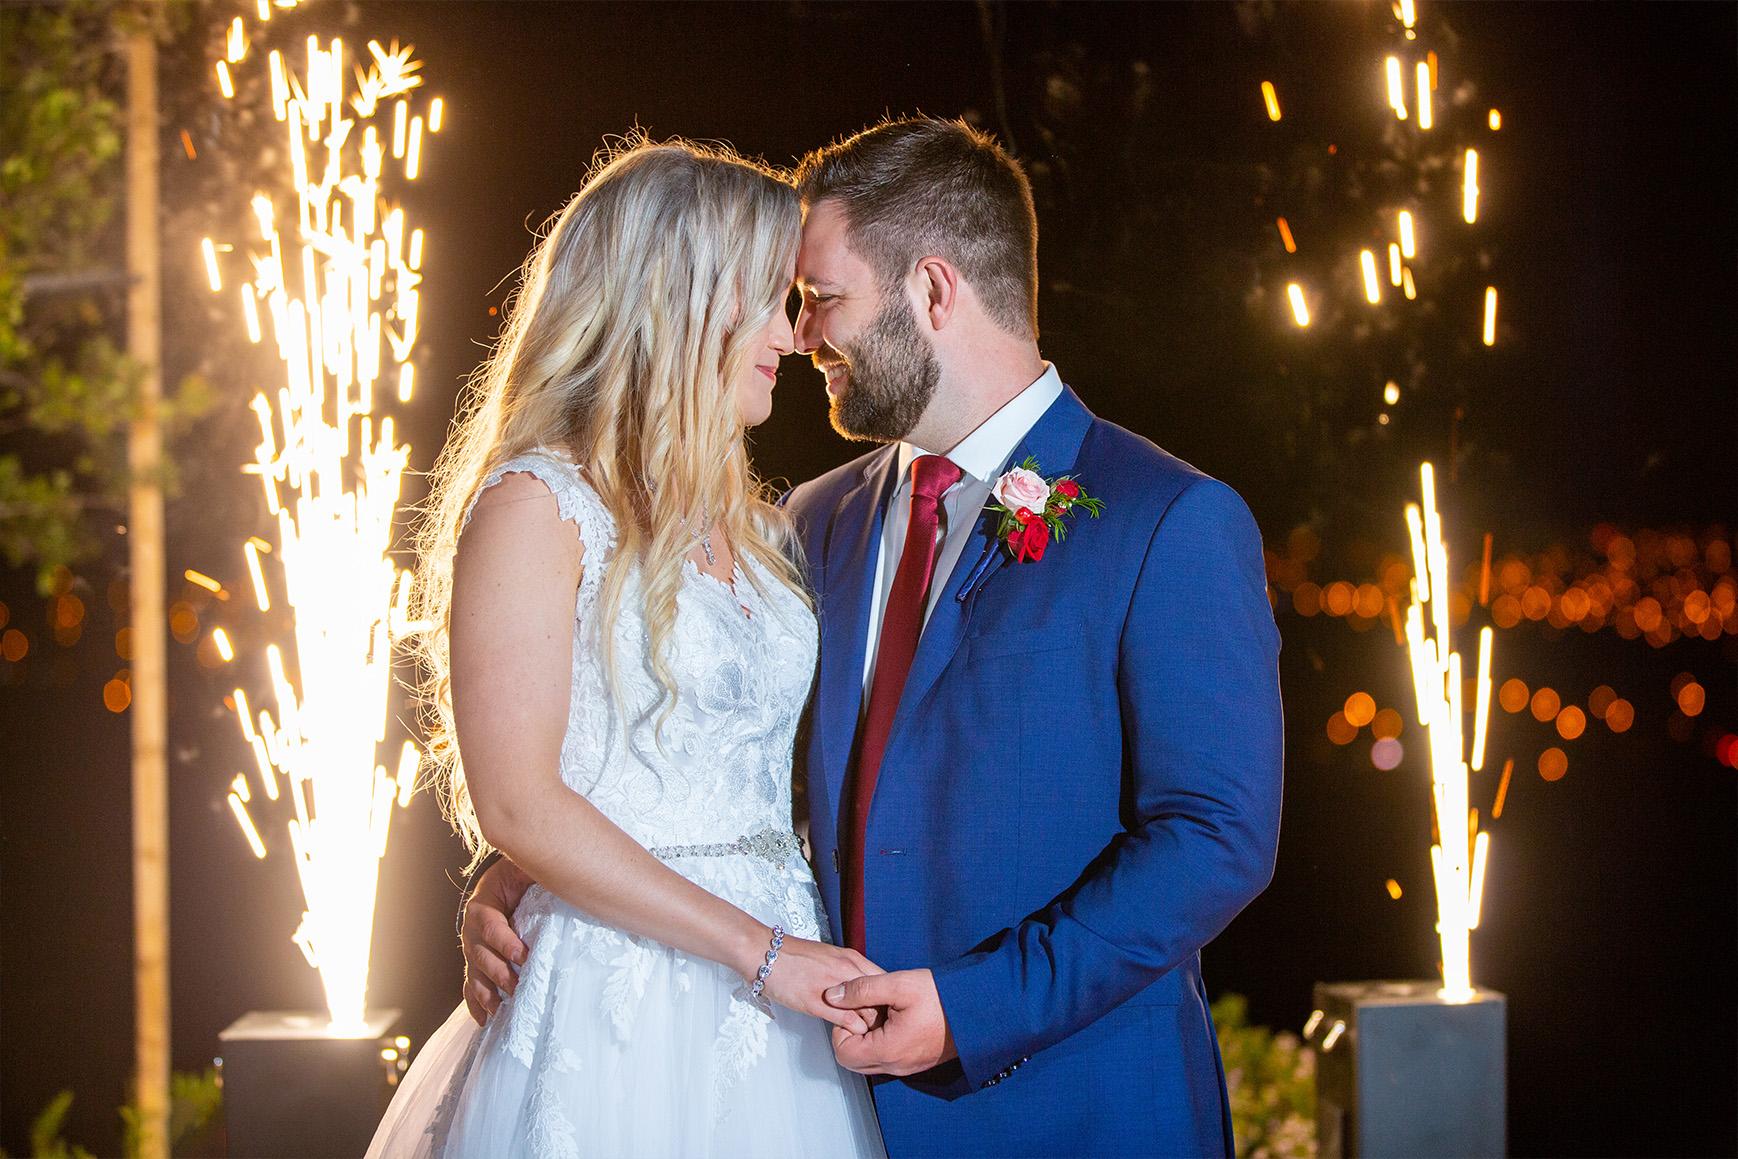 A grand sparkler moment to conclude your day - Boulder Ridge - Los Gatos, California - San Jose, California - Santa Clara County - Wedgewood Weddings